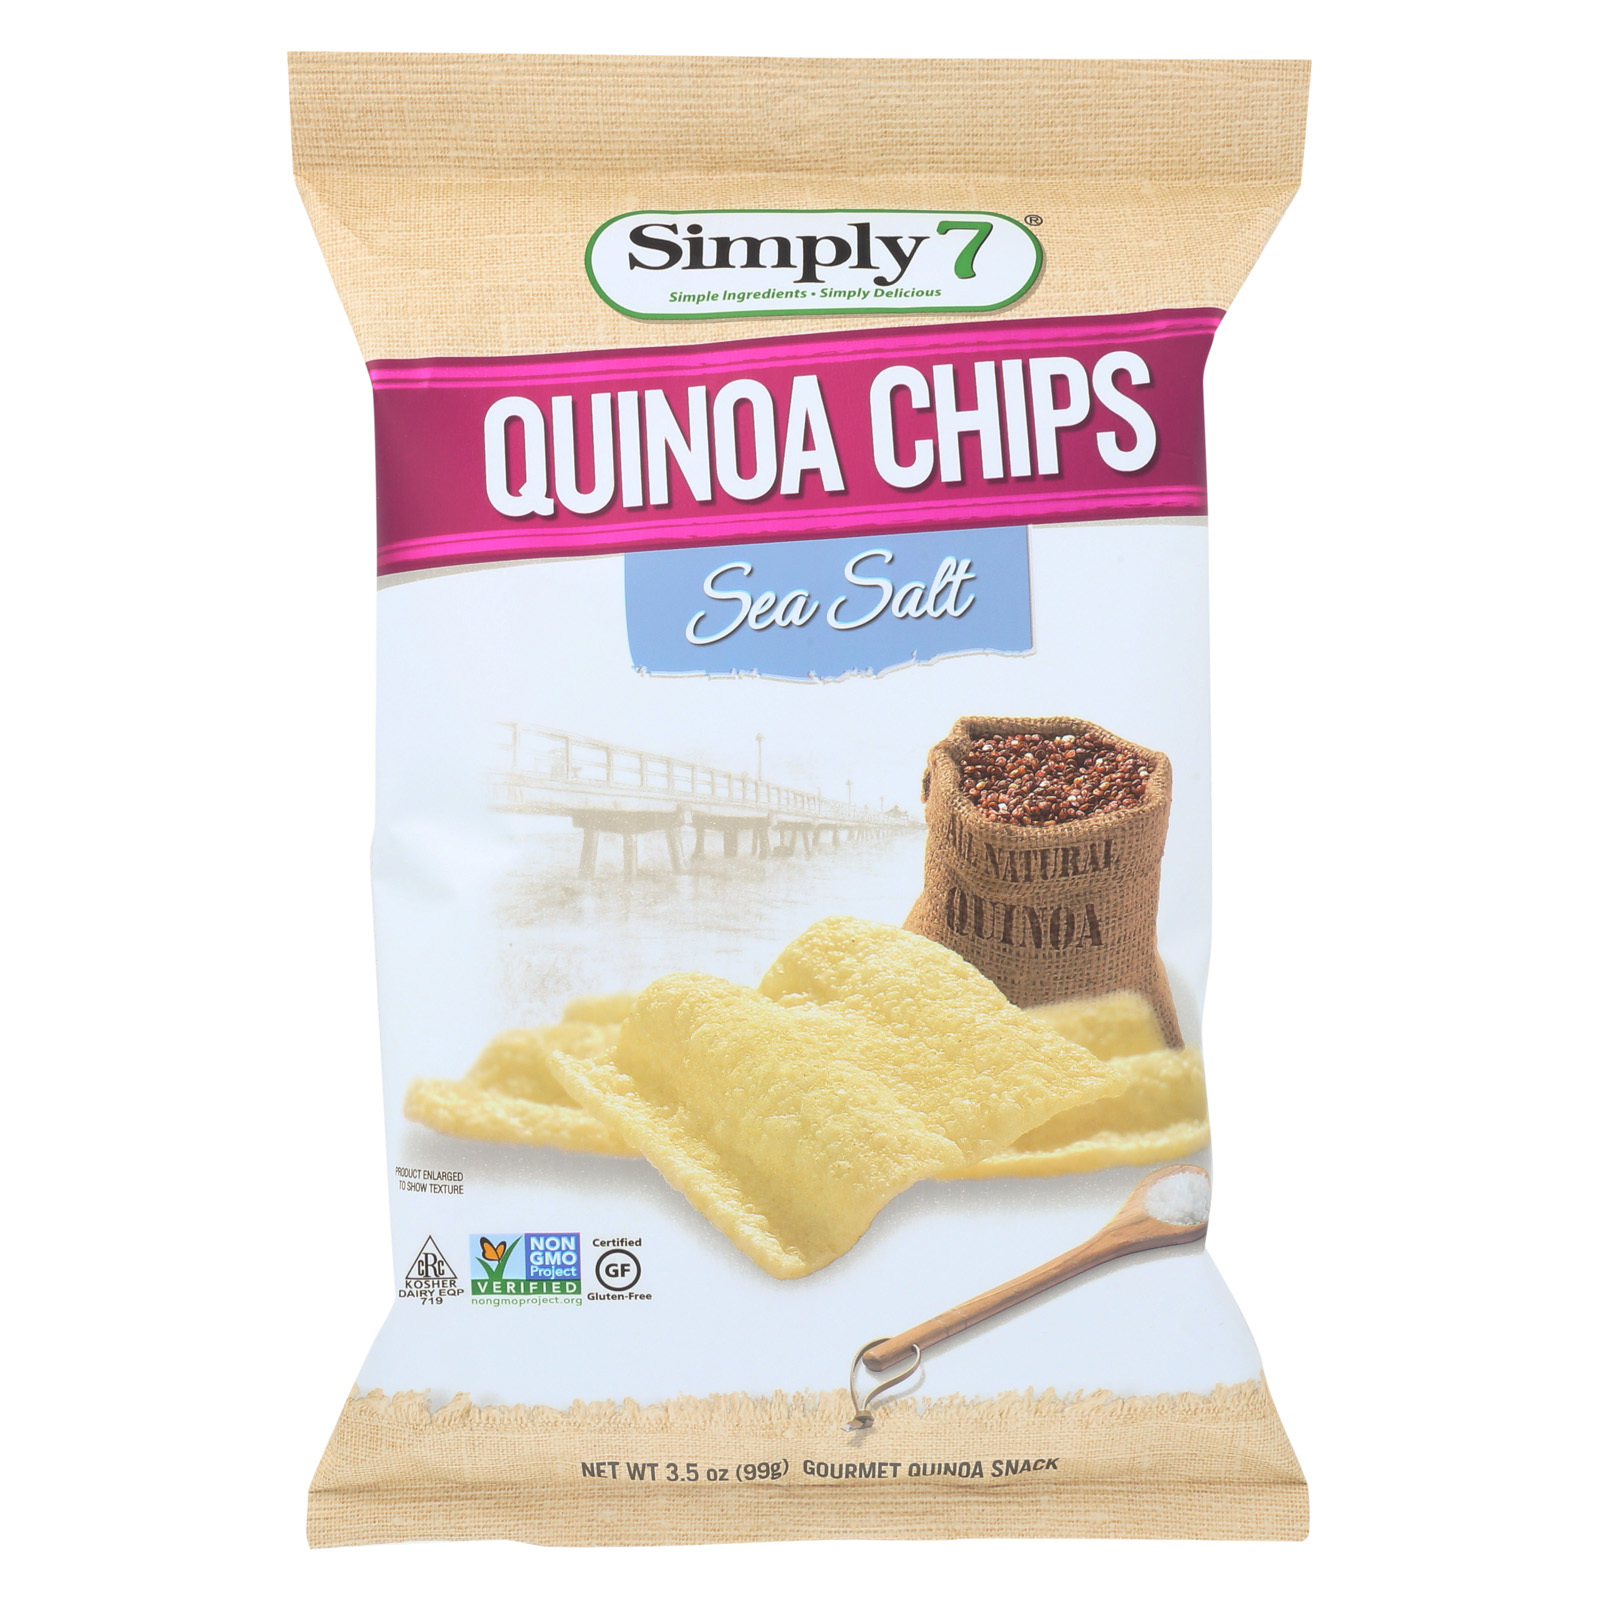 Simply 7 Quinoa Chips - Sea Salt - Case of 12 - 3.5 oz.